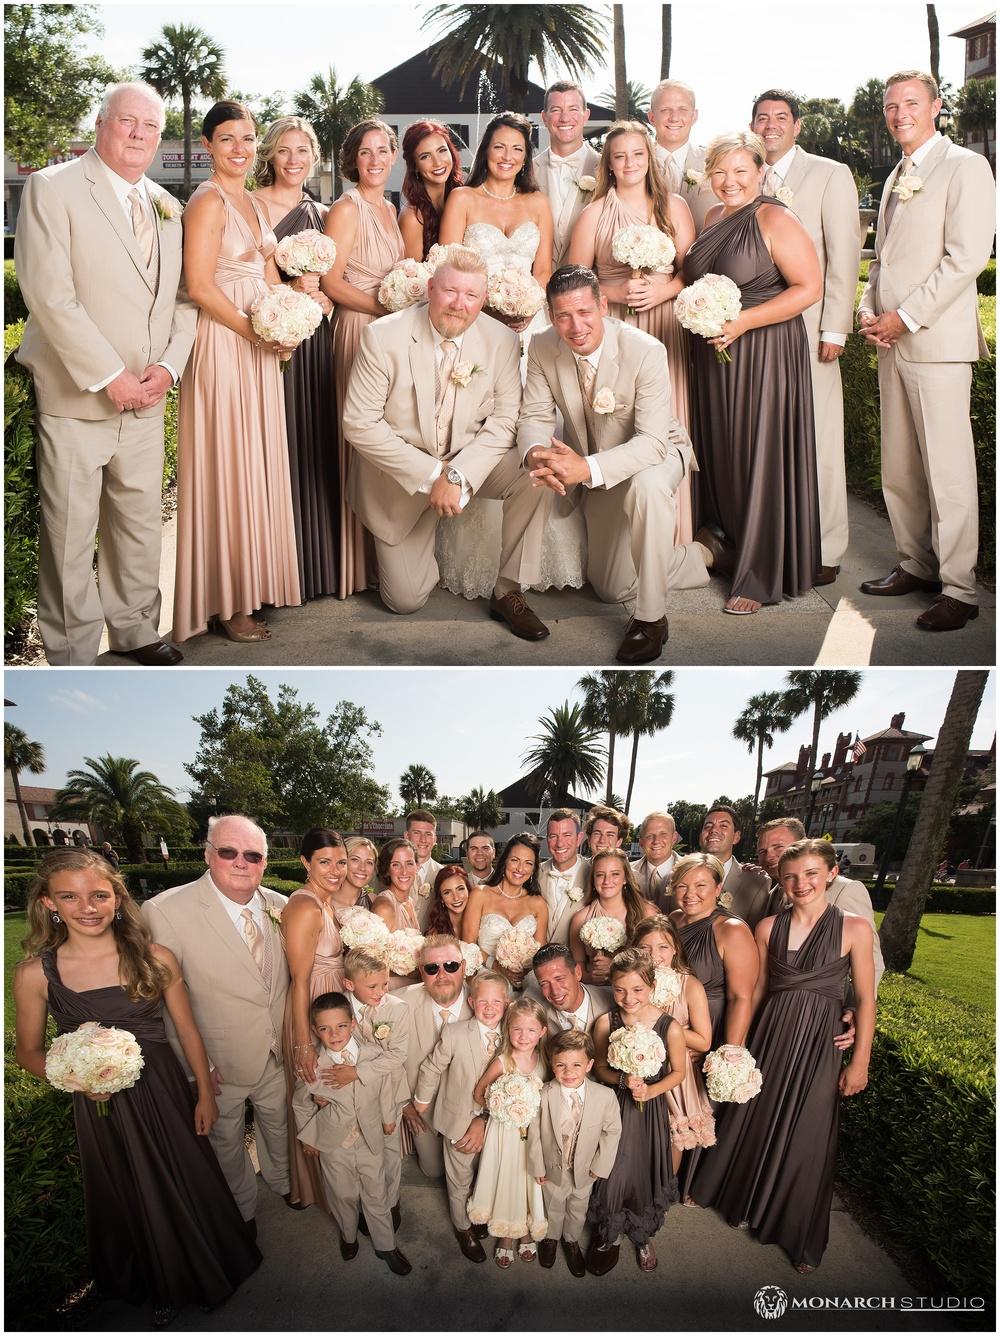 st-augustine-photographer-casa-monica-wedding-043.jpg